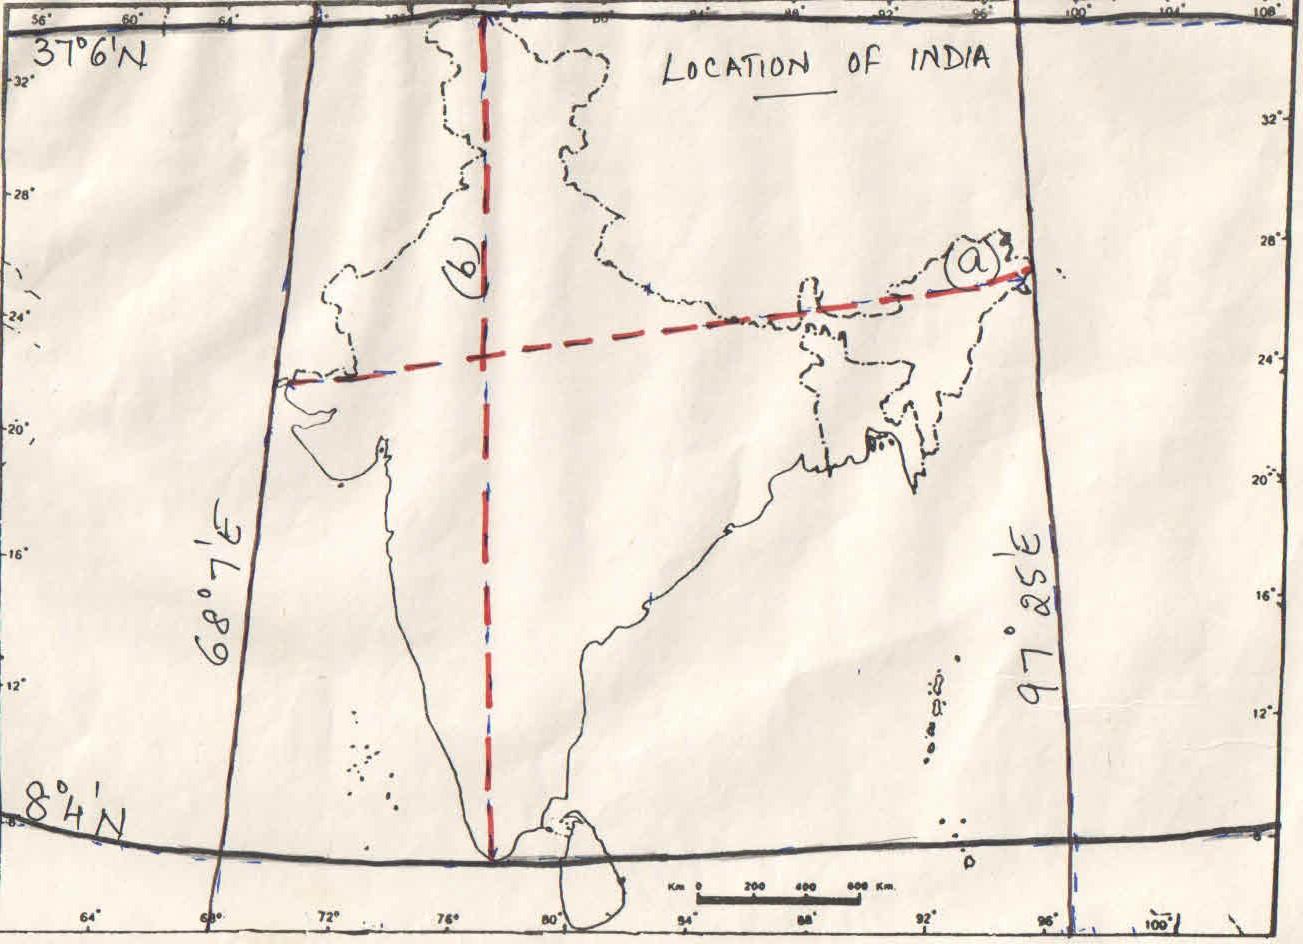 1.Latitudinal extent of India-8*4u0027N-37*6u0027N 2.Longitudinal extent of India-68*4u0027E-97*25u0027E (a) EAST-WEST extent-2933KM (b) NORTH-SOUTH extent -3214KM  sc 1 st  jasminerachelu0027s way & jasminerachelu0027s way: CLASS XII-Location of India.